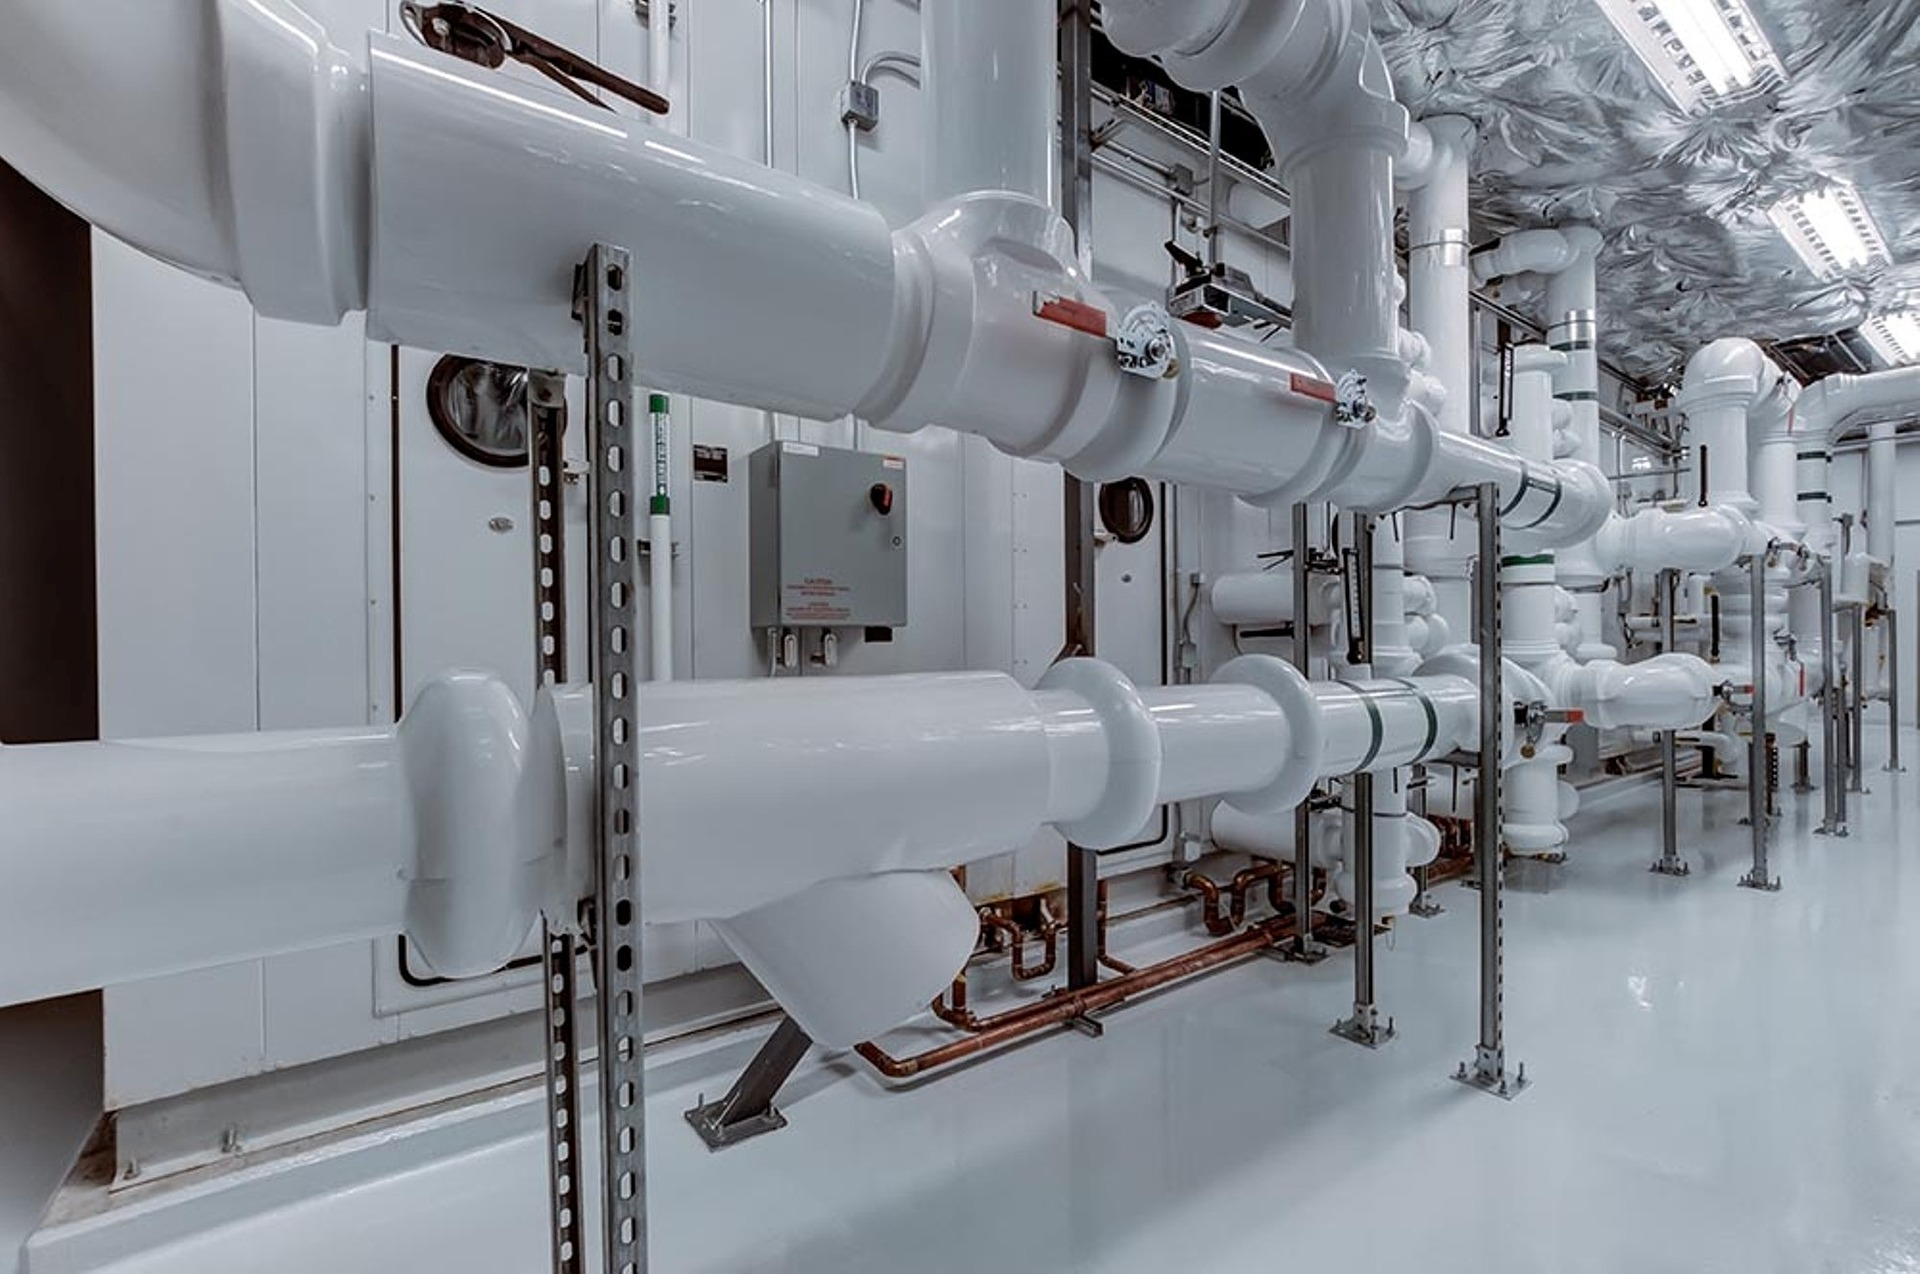 Industrial Plumbing Repair and Servicing in Las Vegas ACR Mechanical